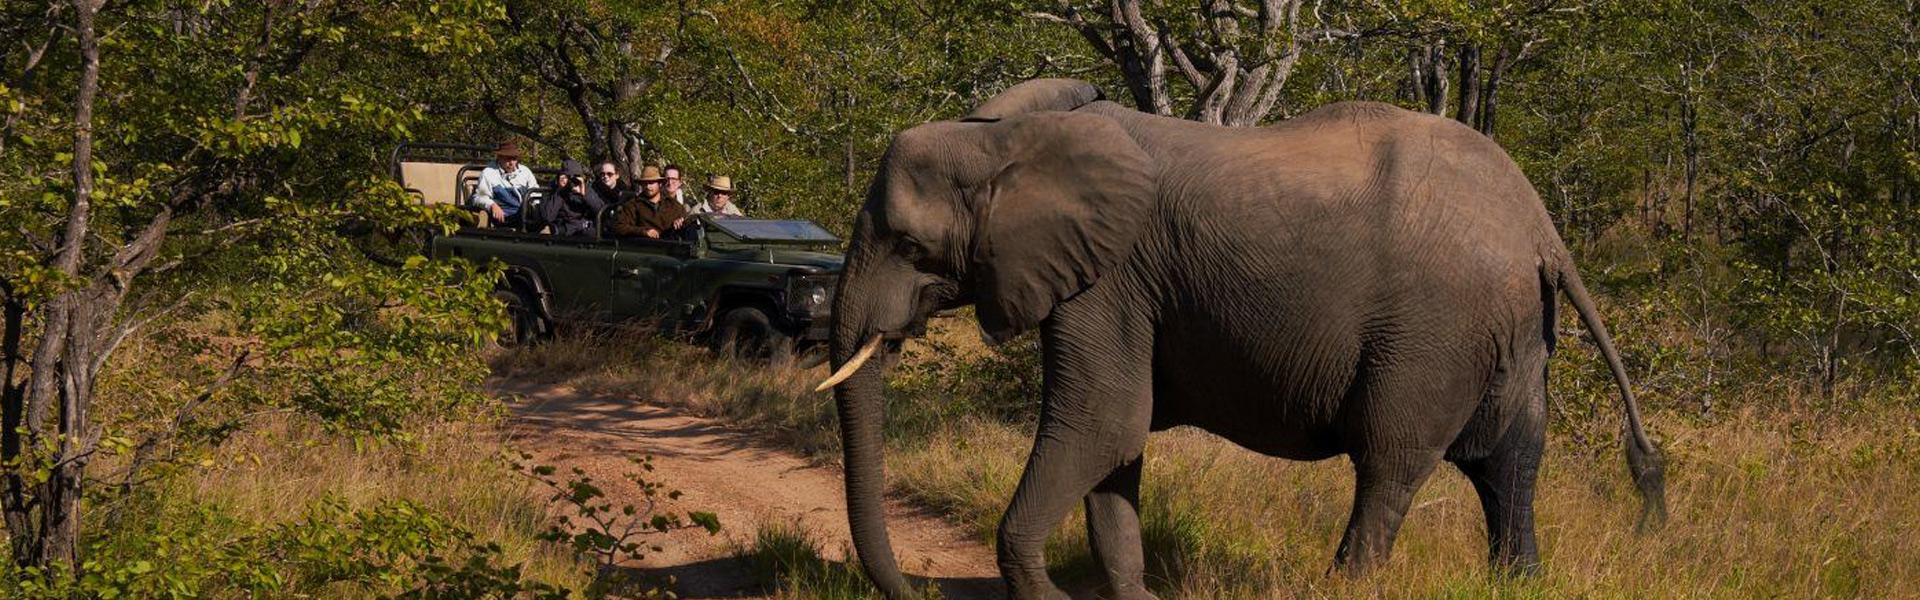 List of things to take on Safari